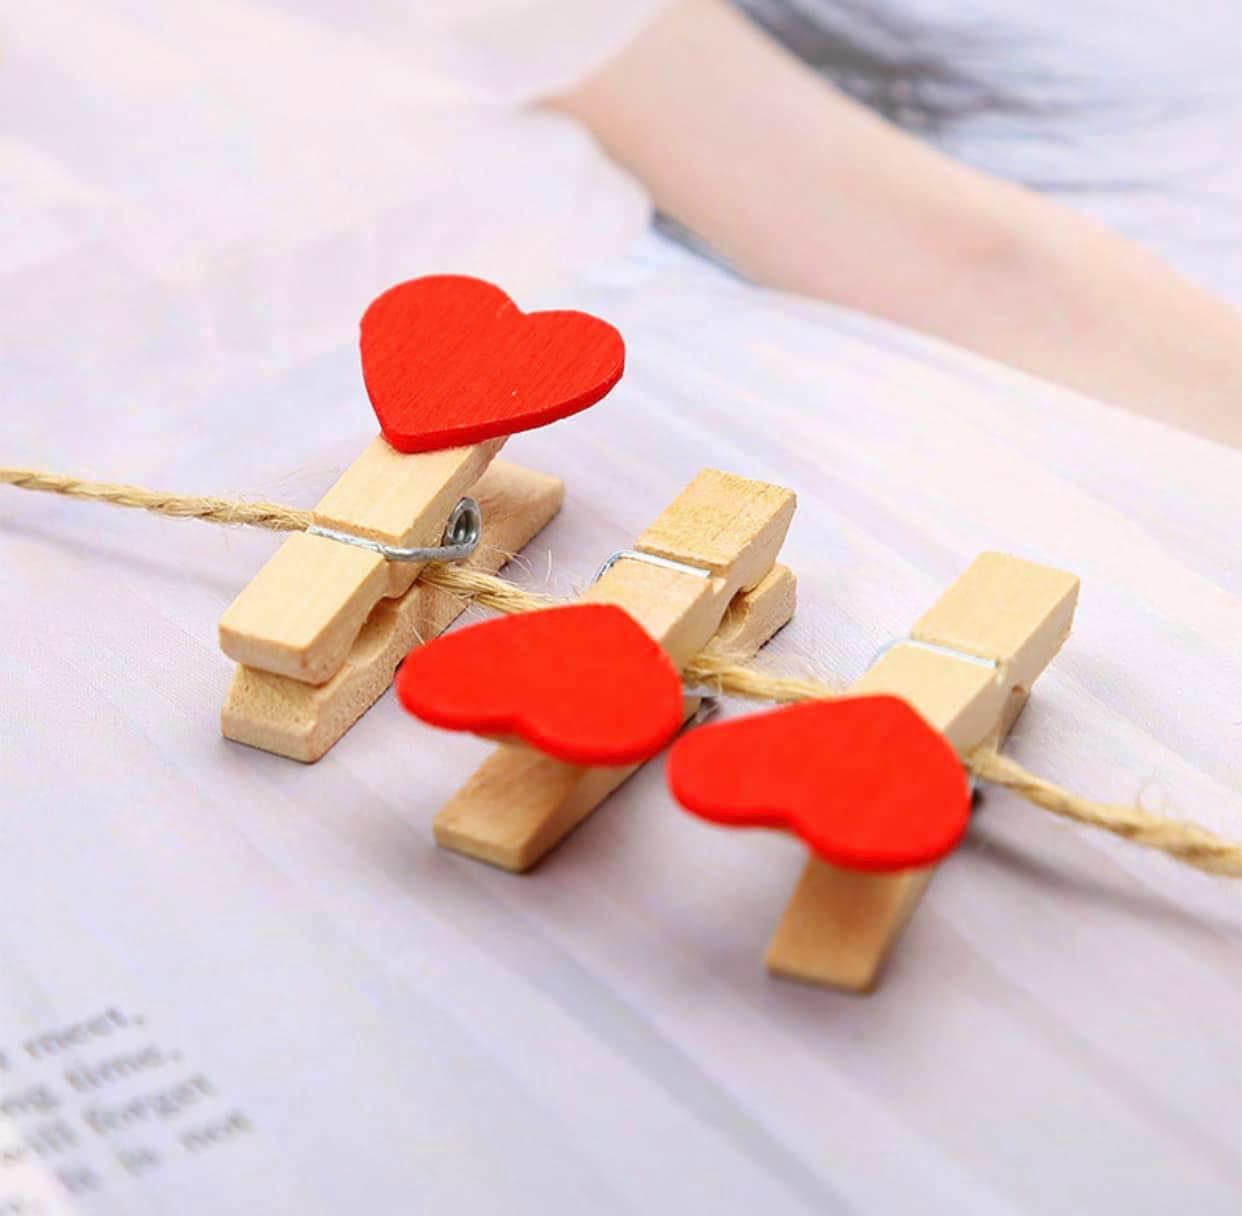 Kẹp gỗ set10 trái tim đỏ